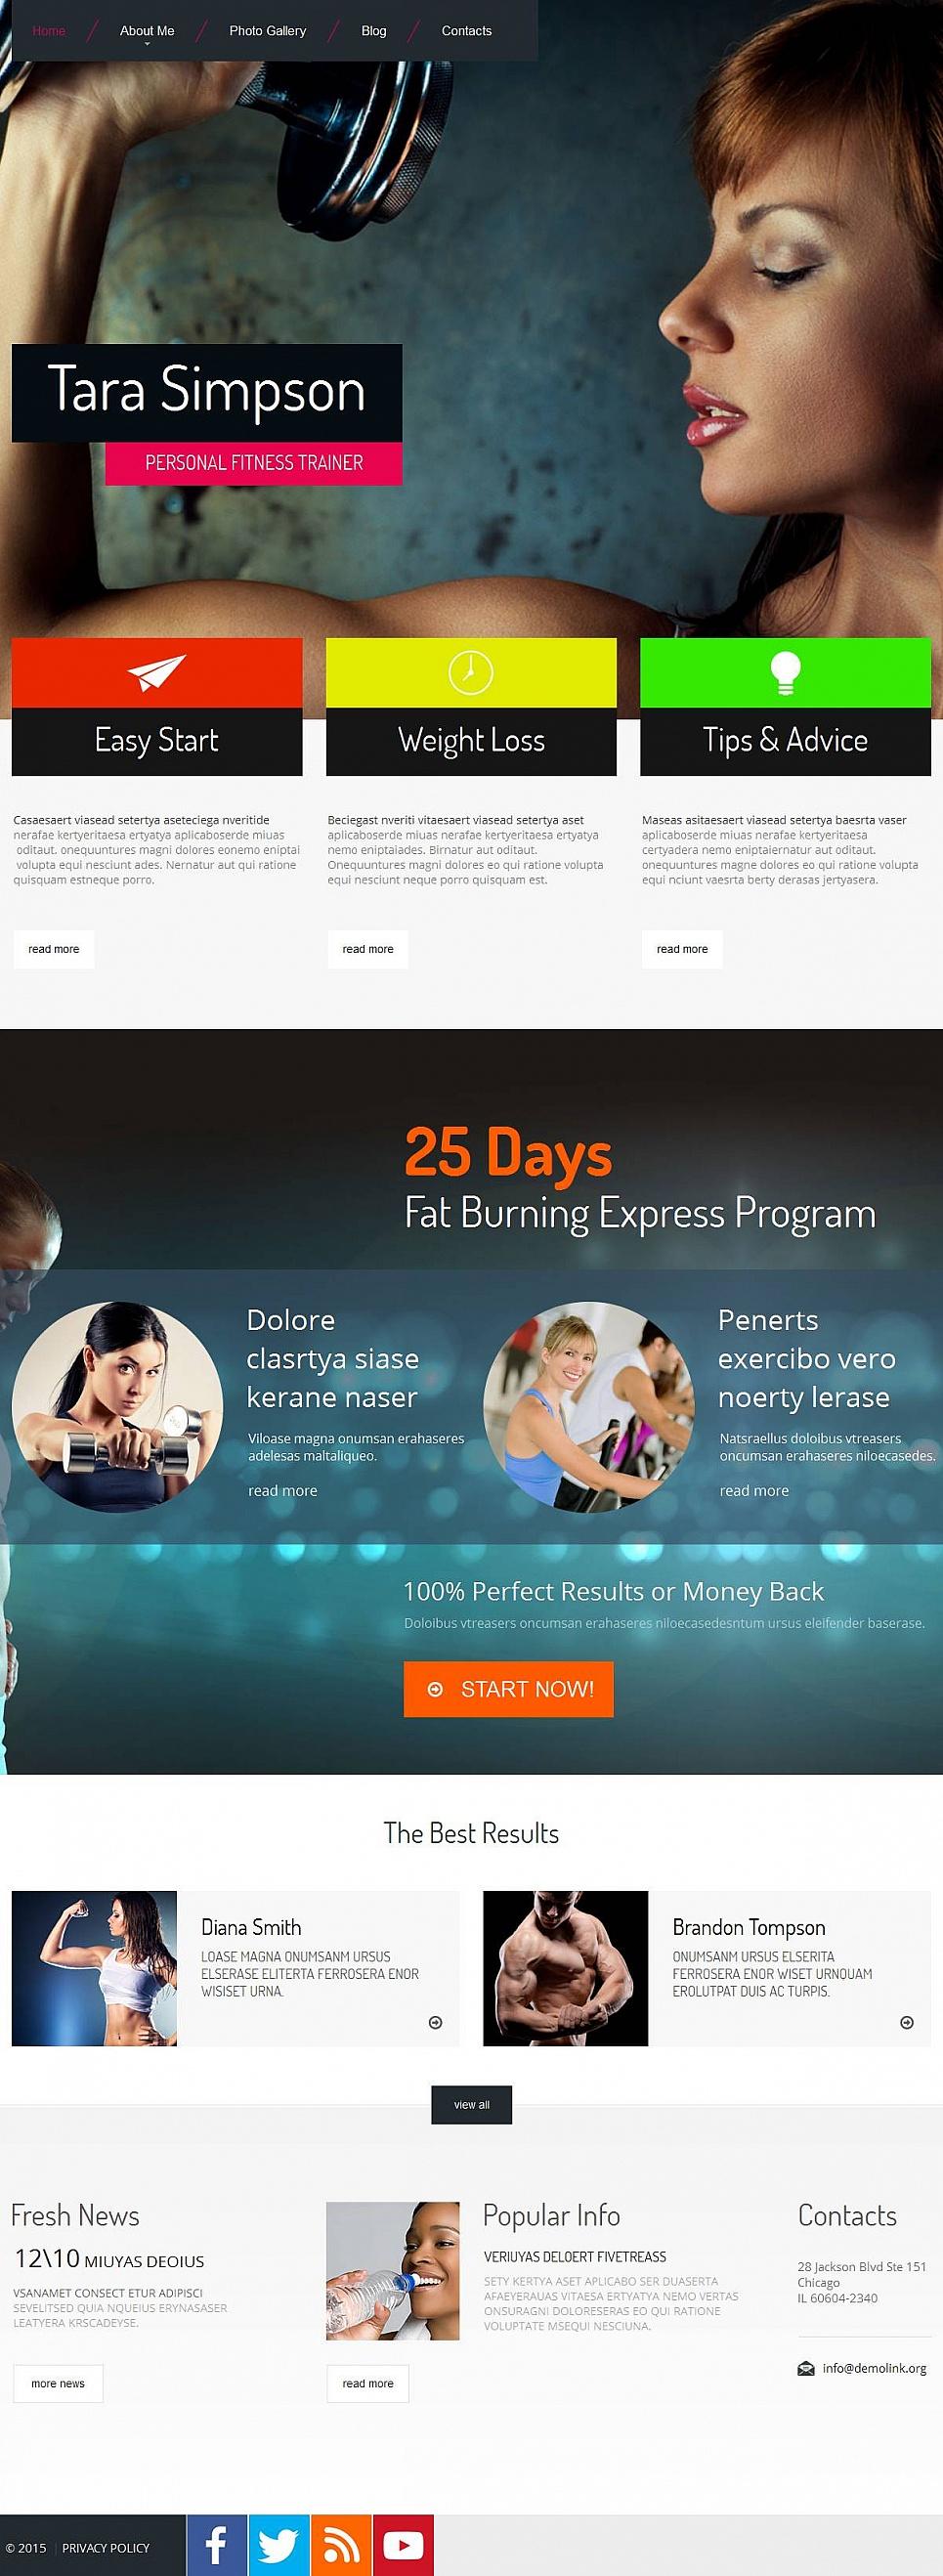 Szablon Strony Osobistego Fitness Trenera - image